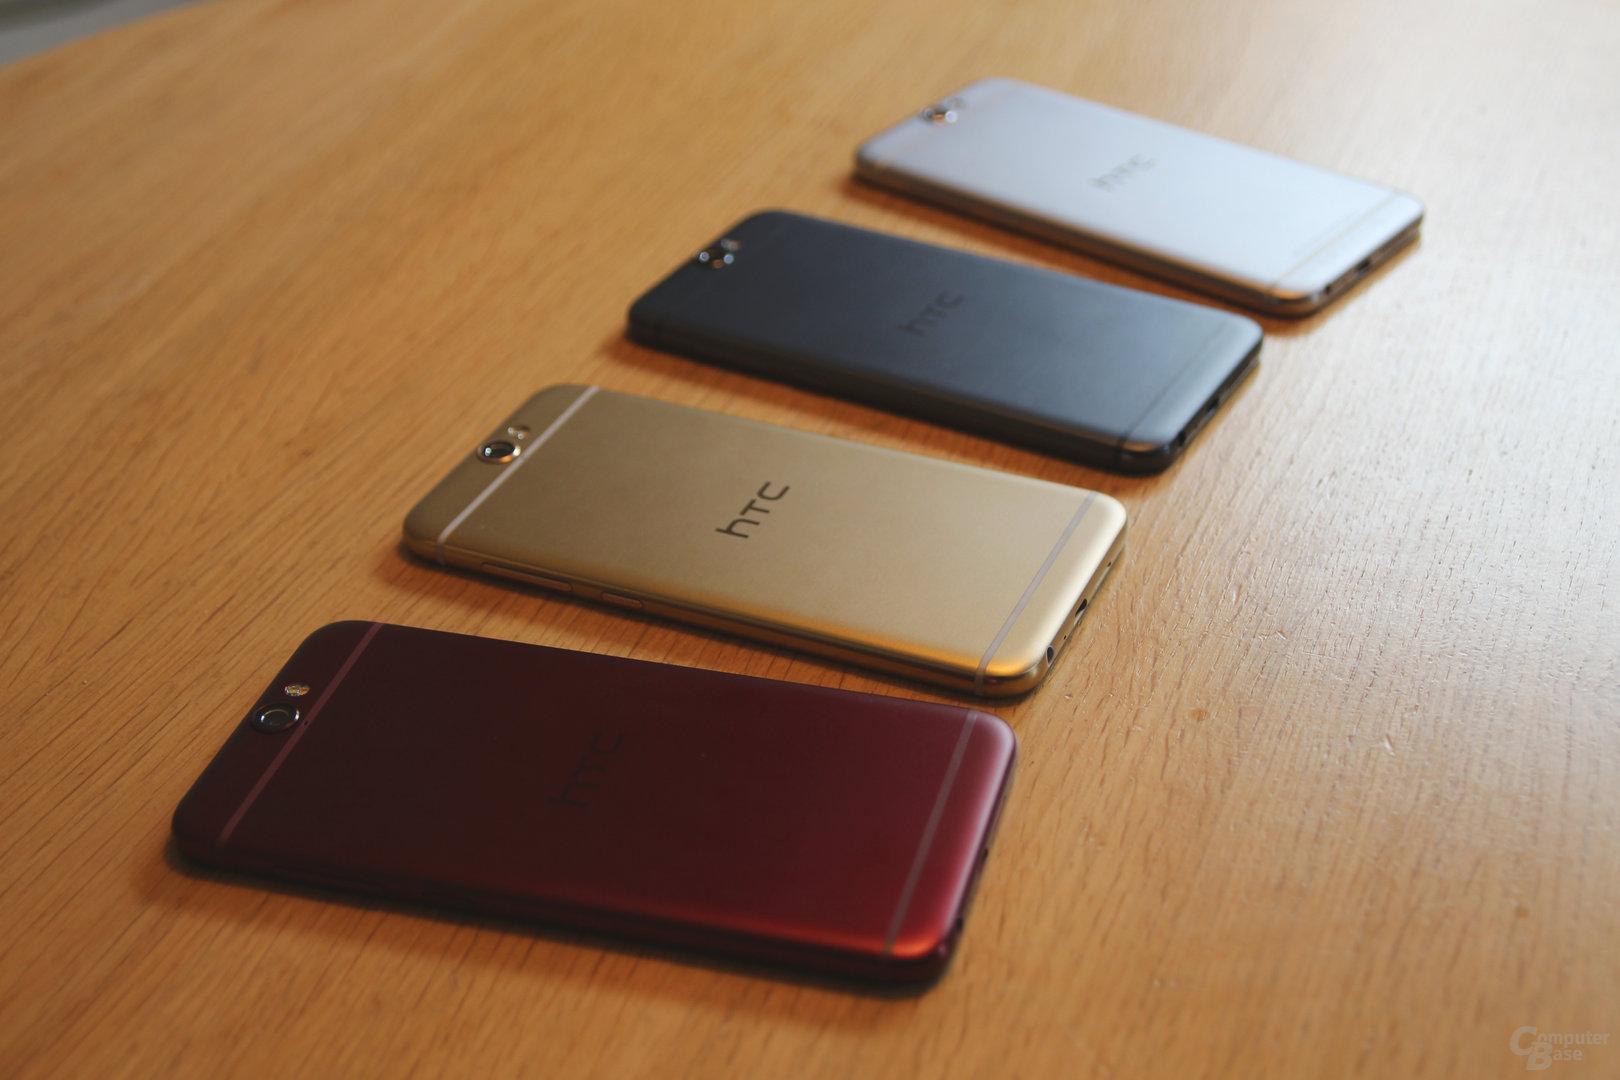 HTC One A9 in Deep Garnet, Topaz Gold, Carbon Grey, Opal Silver